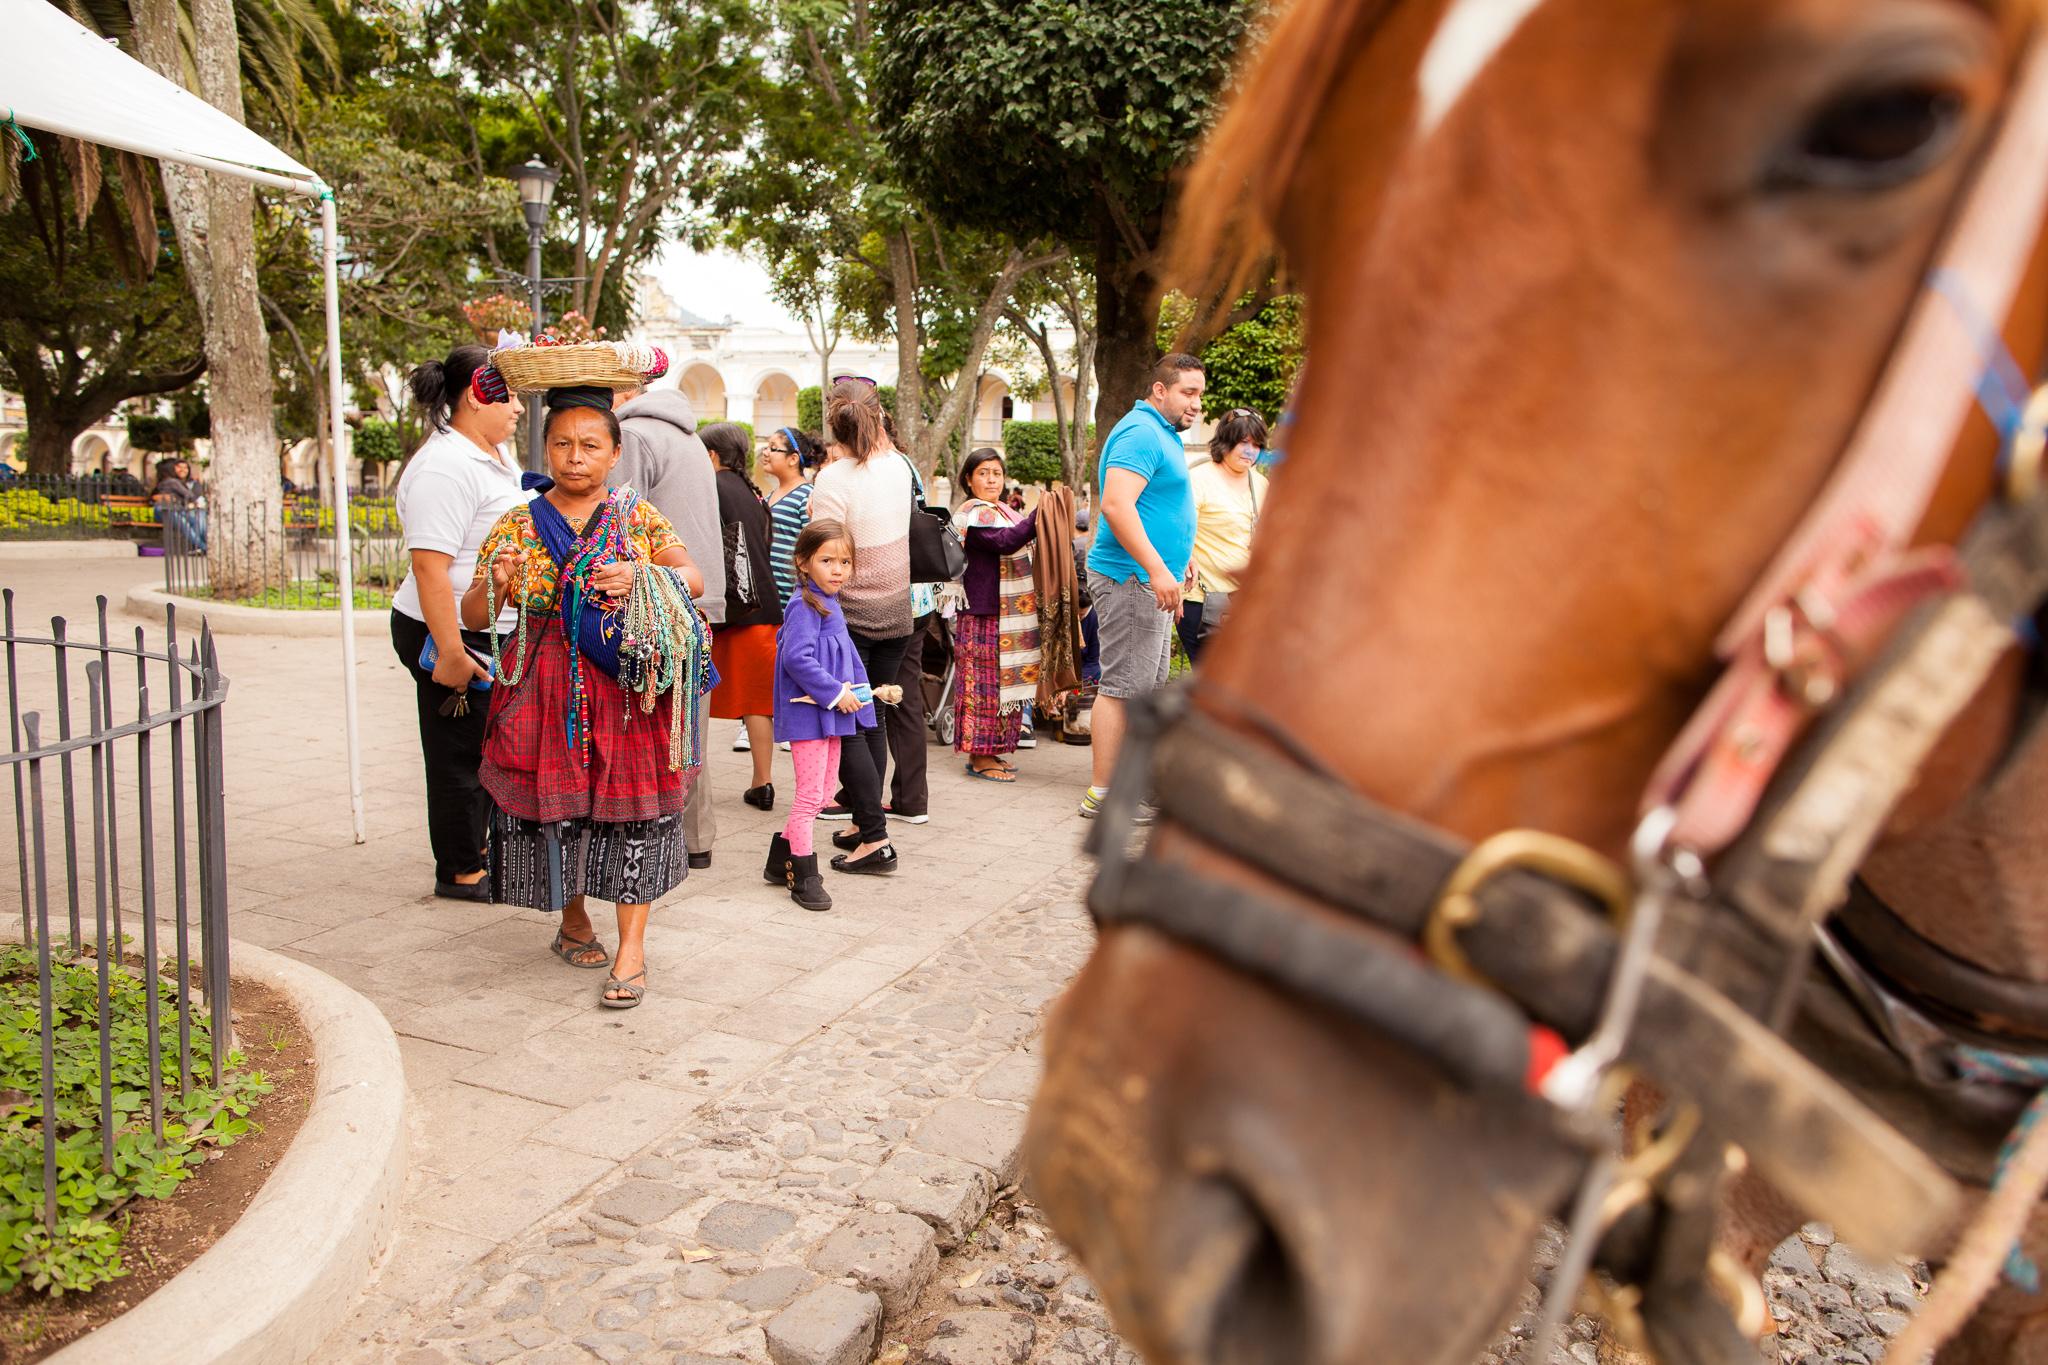 Guatemala-CP-160804-009.jpg